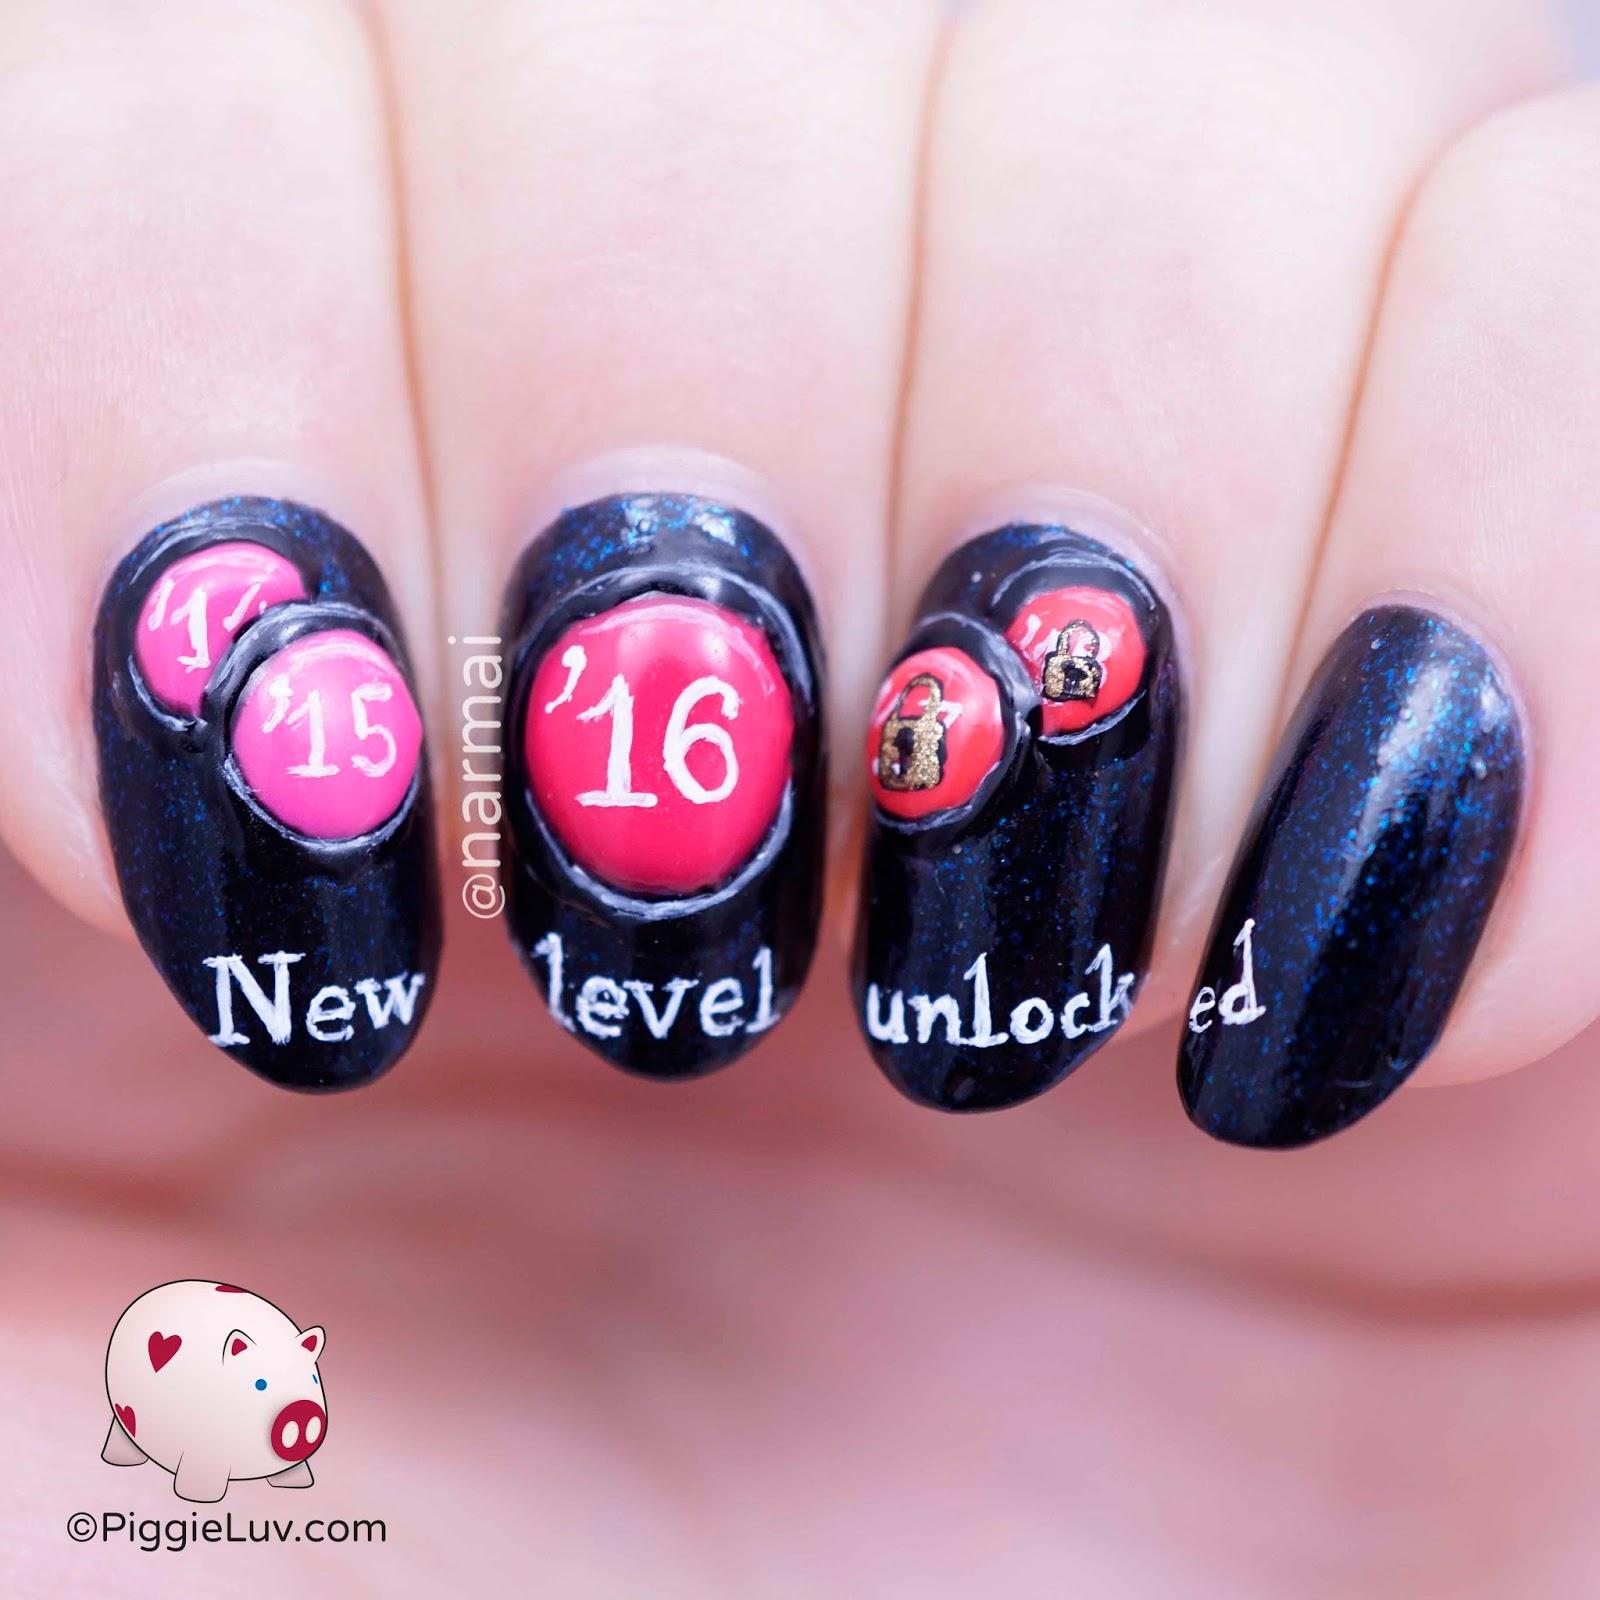 PiggieLuv: 2016: new level unlocked! New Year\'s nail art